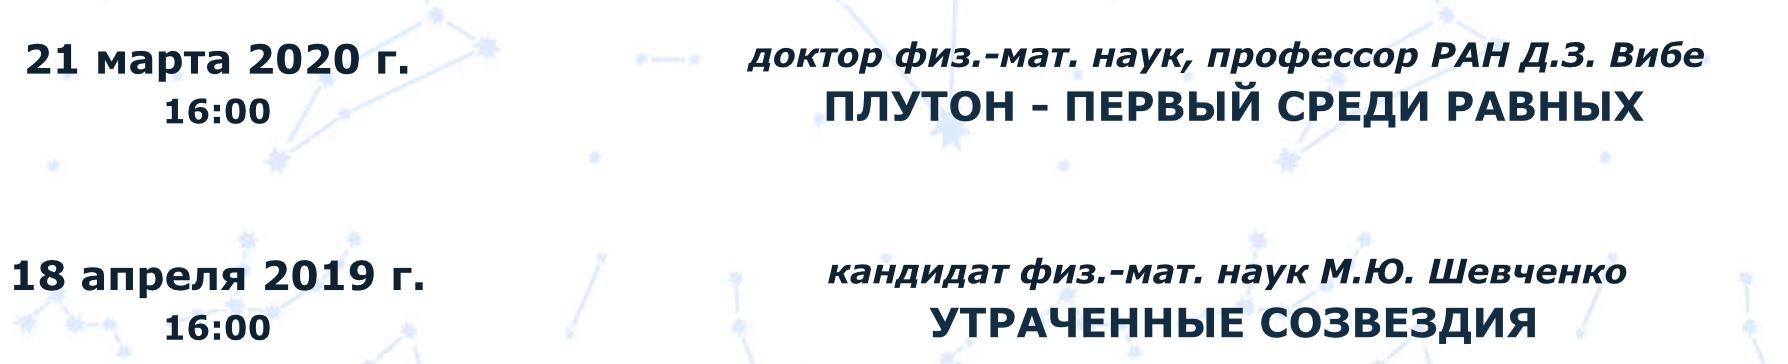 https://media.discordapp.net/attachments/530356293660180481/685746716414443540/image1.png